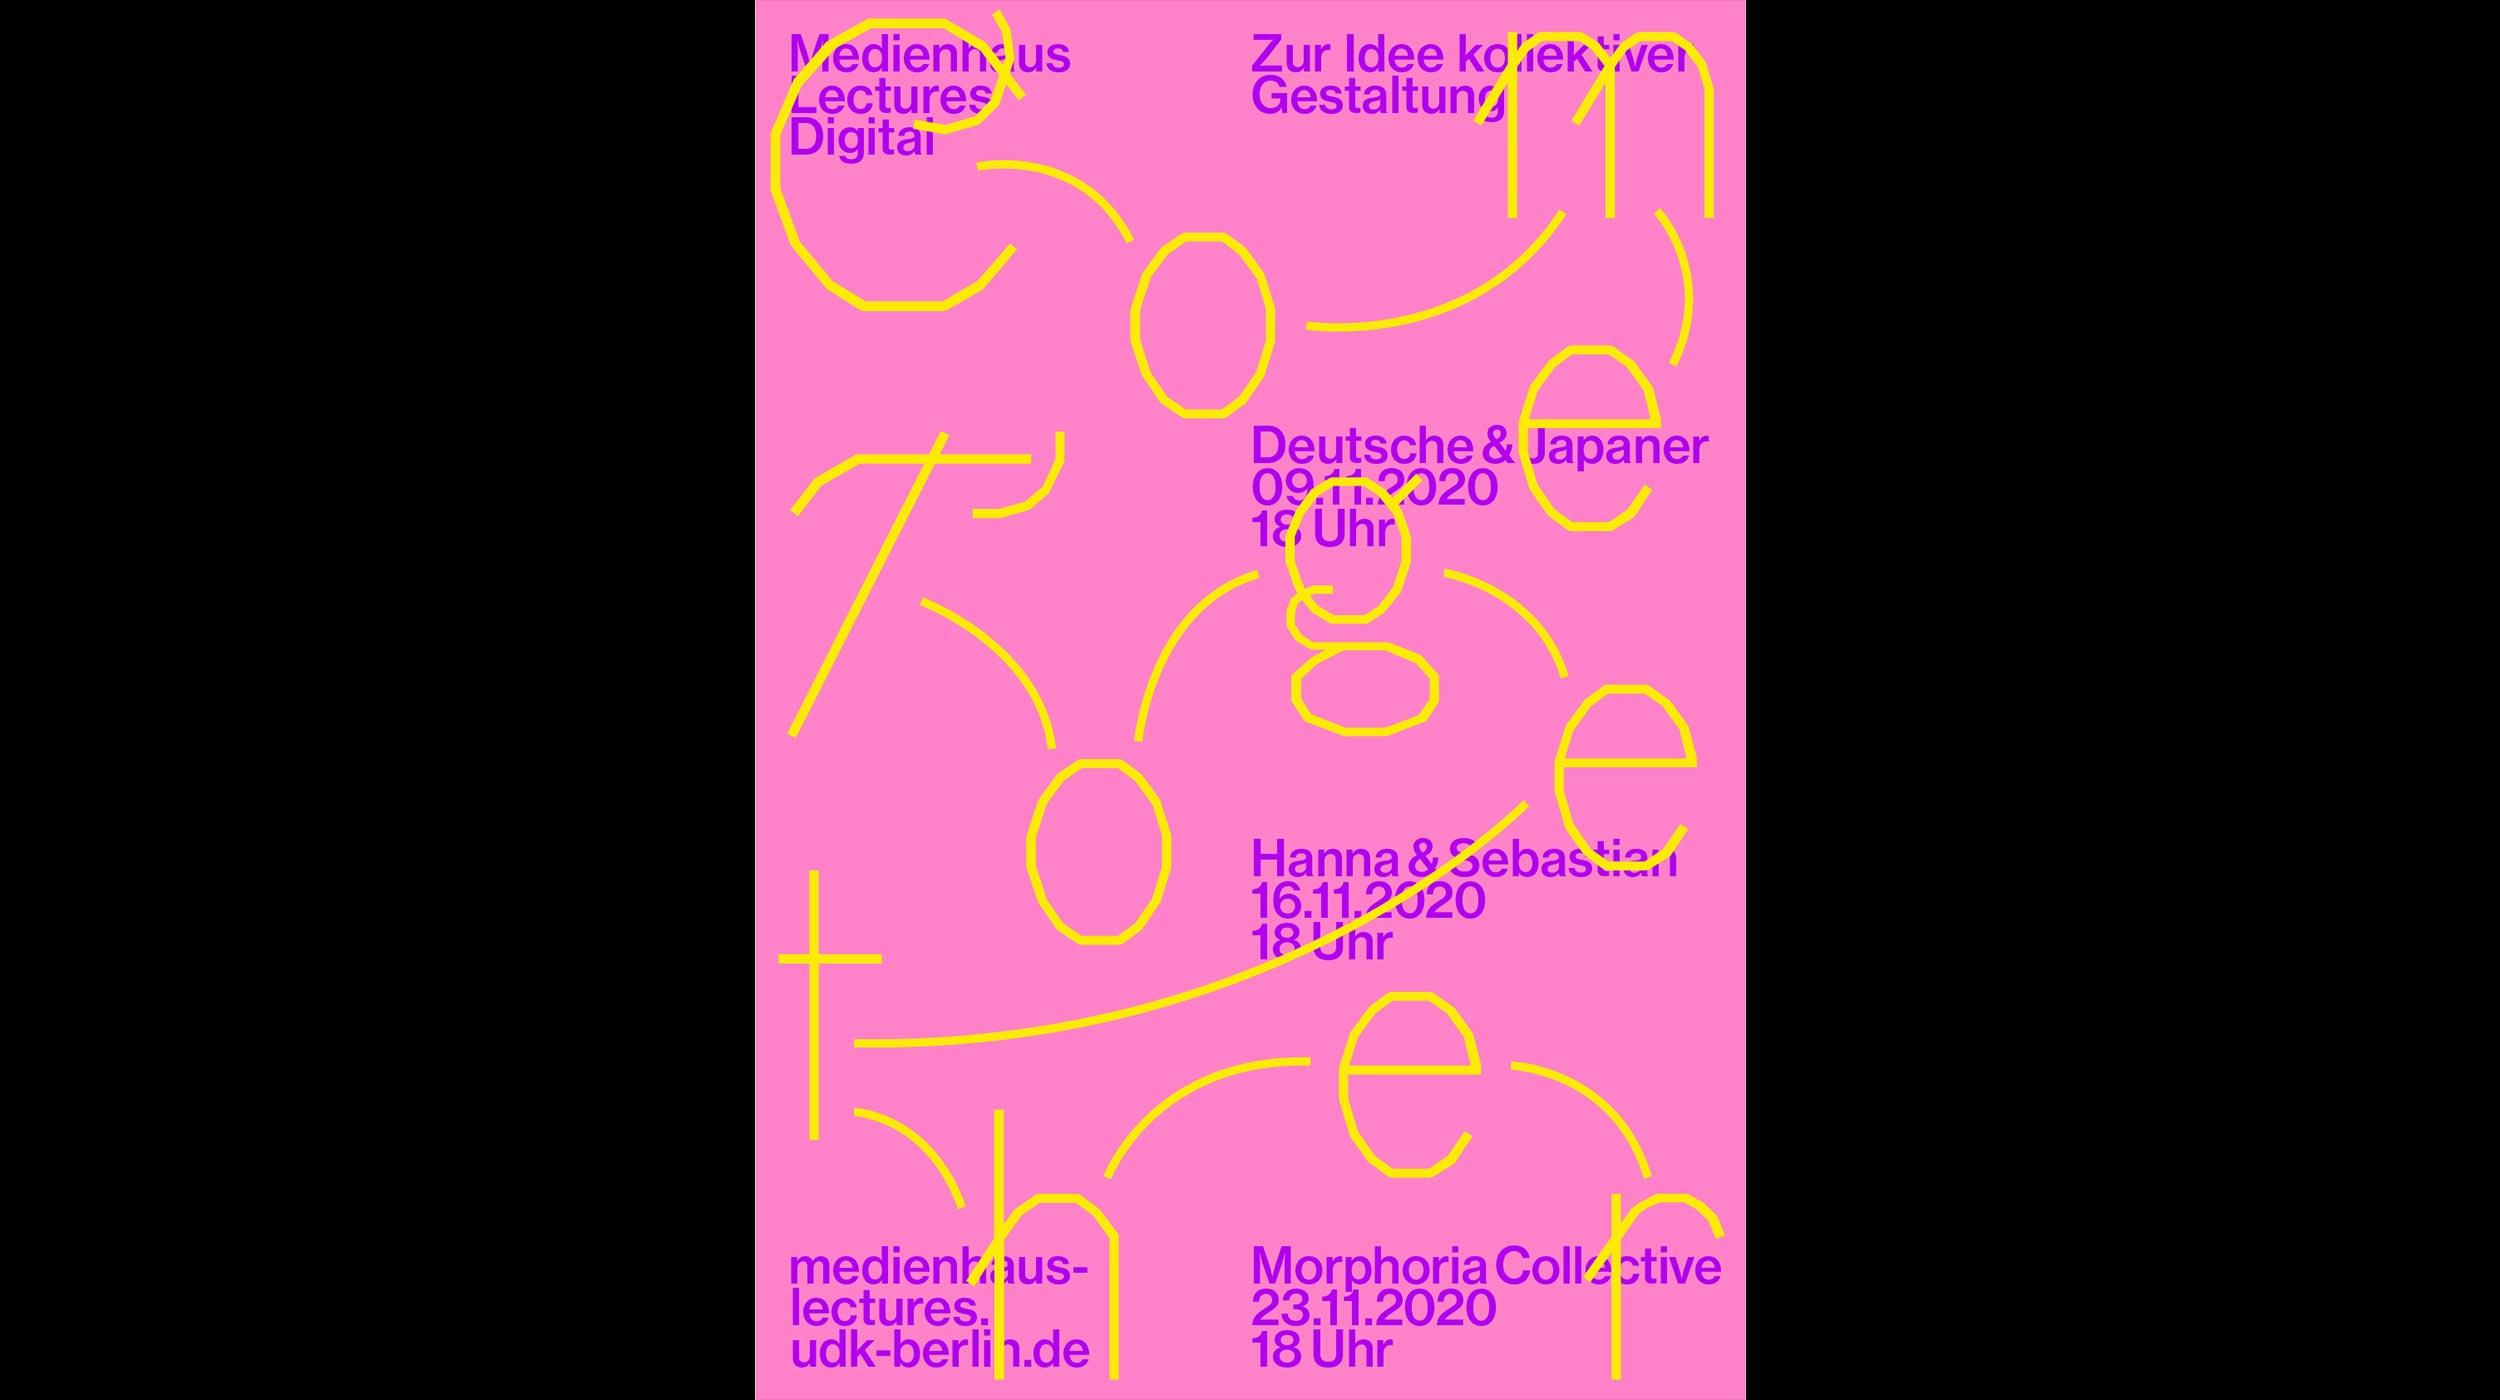 Moritz_Borchardt_Medienhaus_Lectures_Digital_01